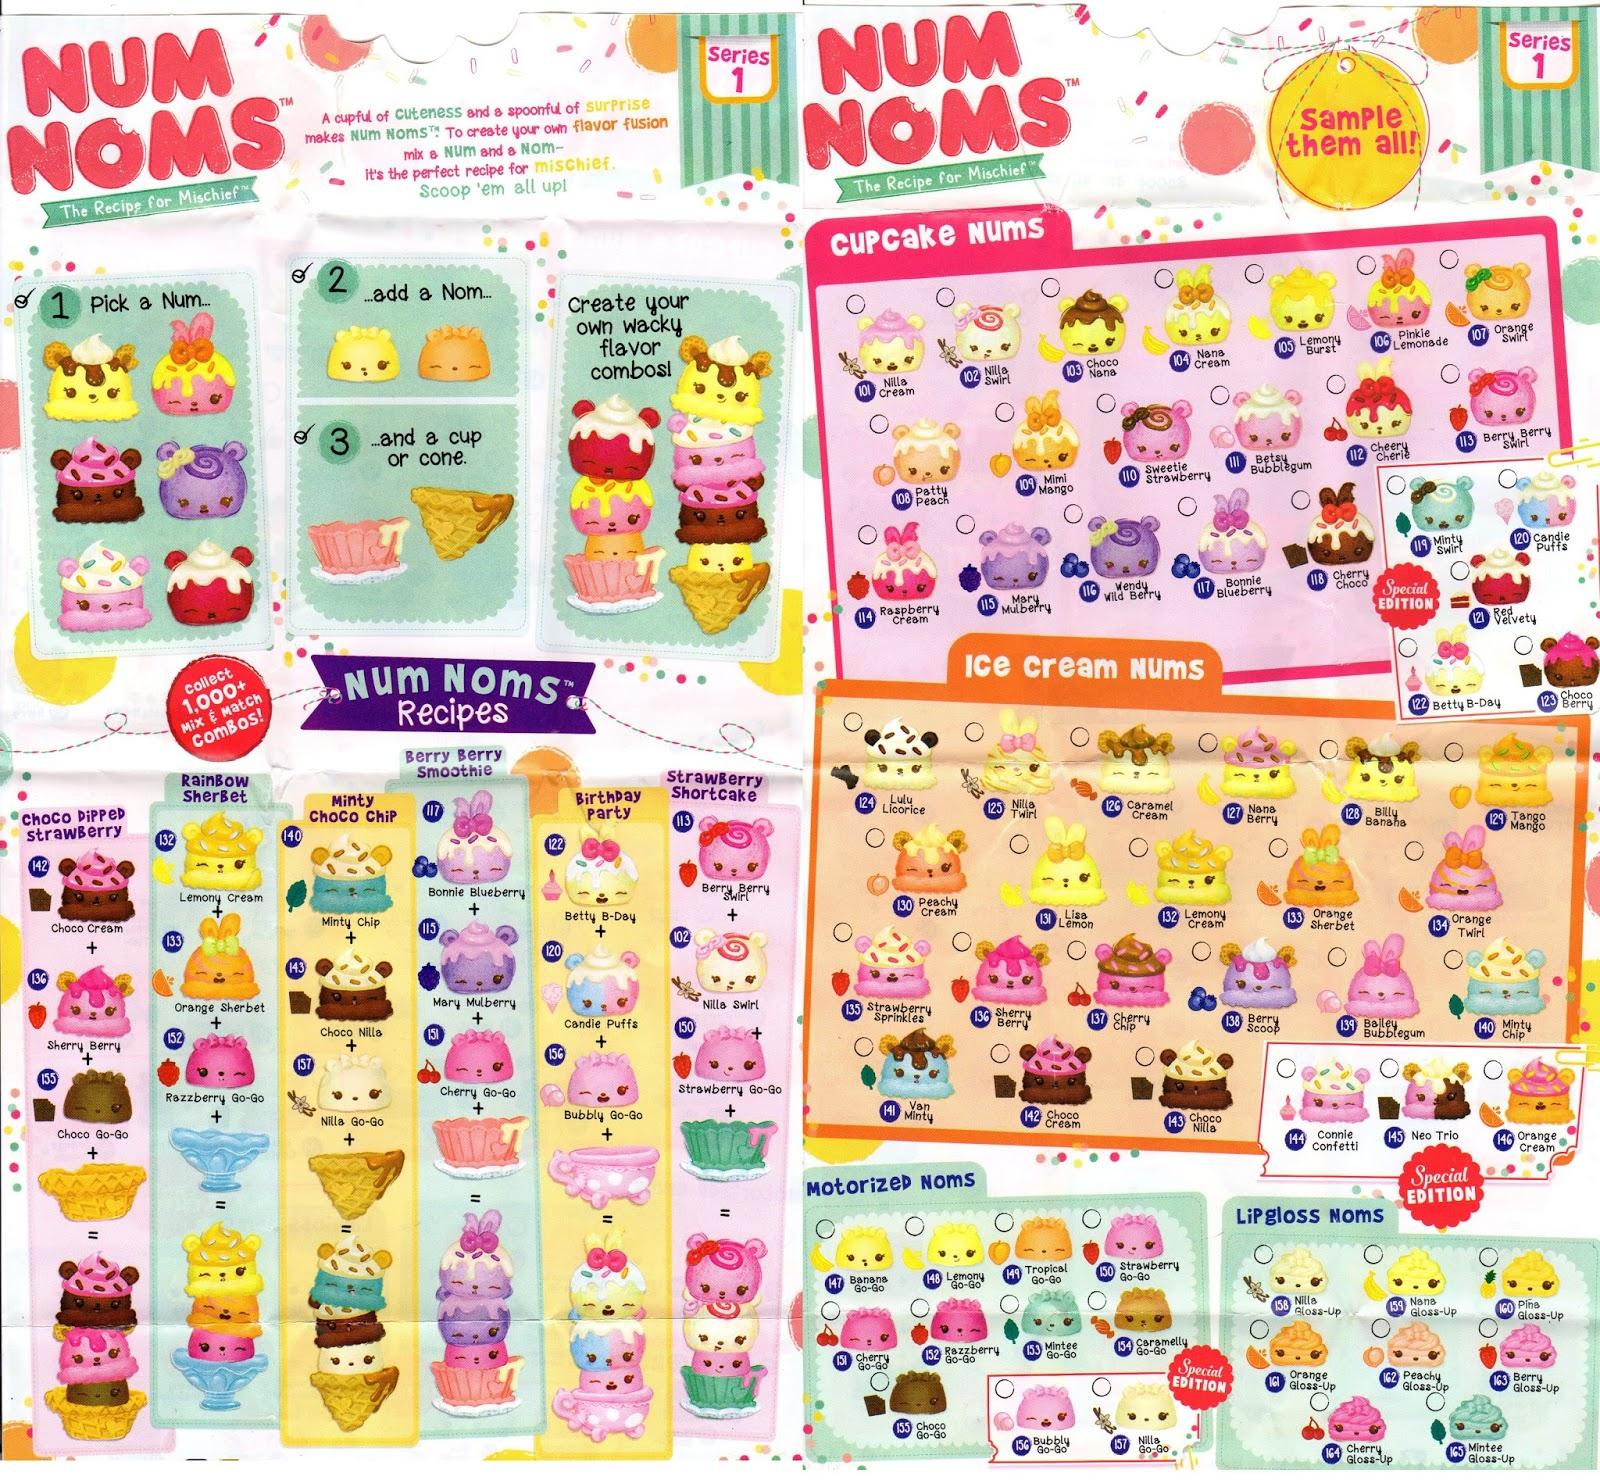 Peach Booty Reviews ᴗ Num Noms Toys Review